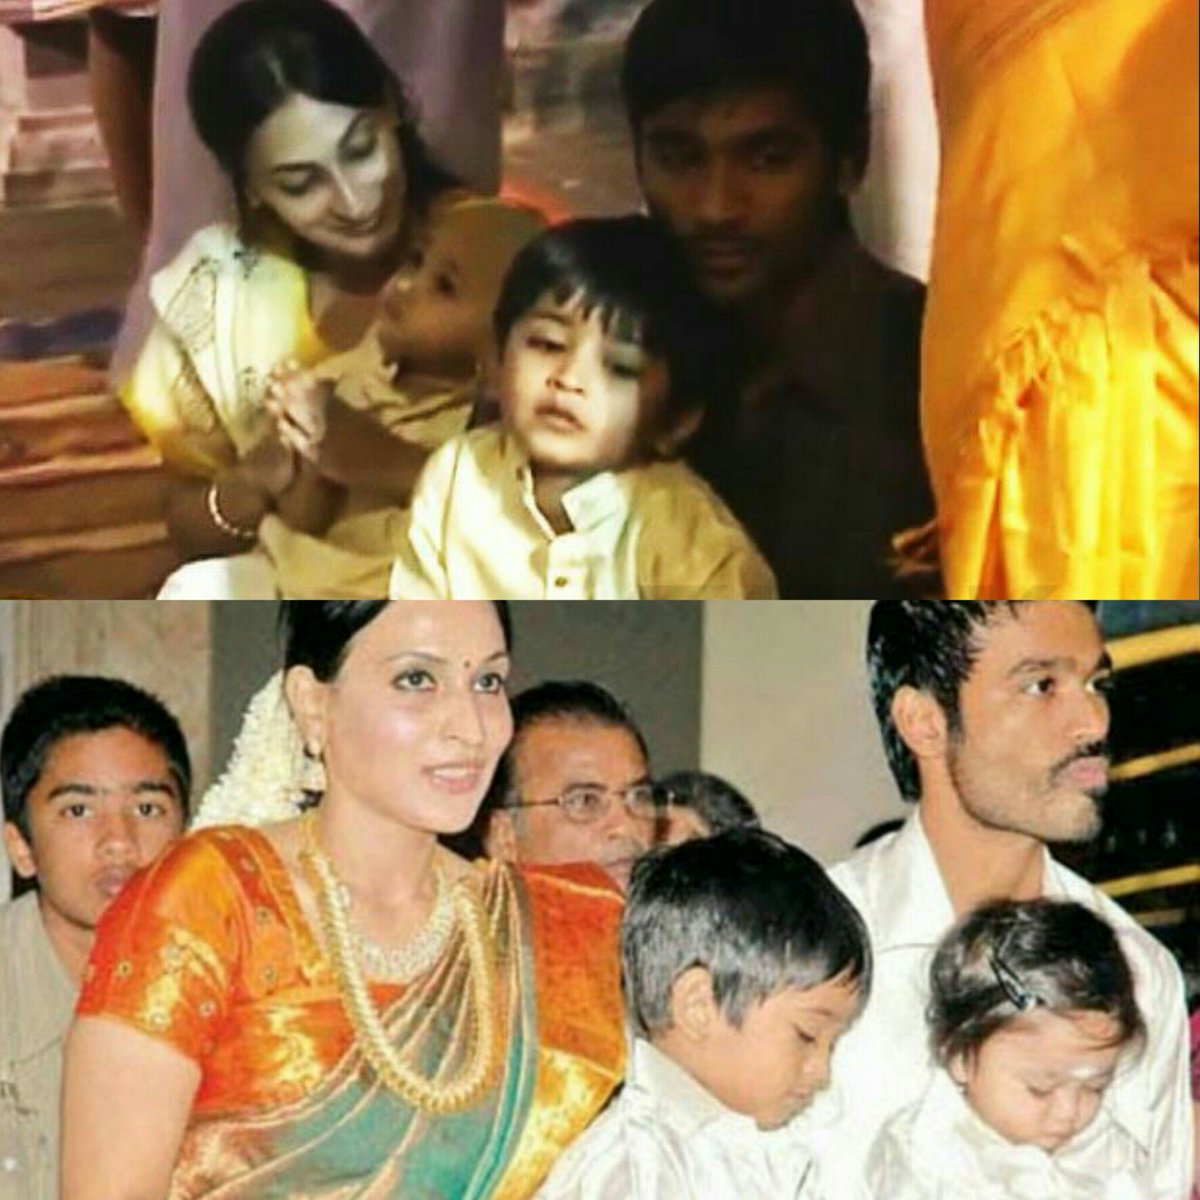 dhanush son yatra and linga photos 65018 gnotes